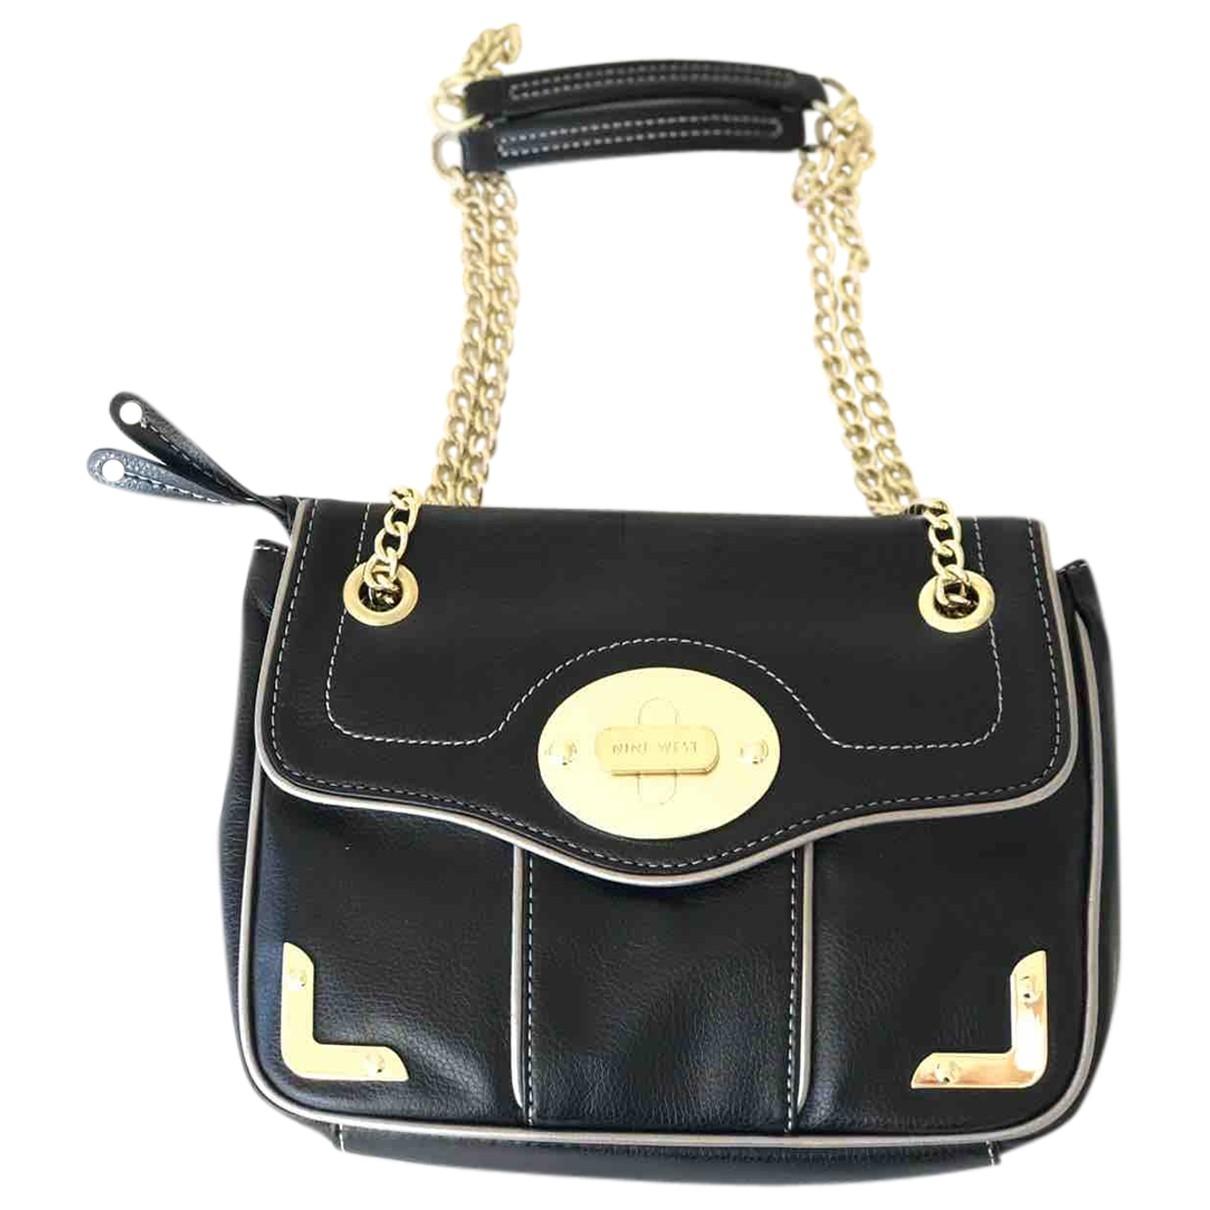 Nine West \N Black Leather handbag for Women \N